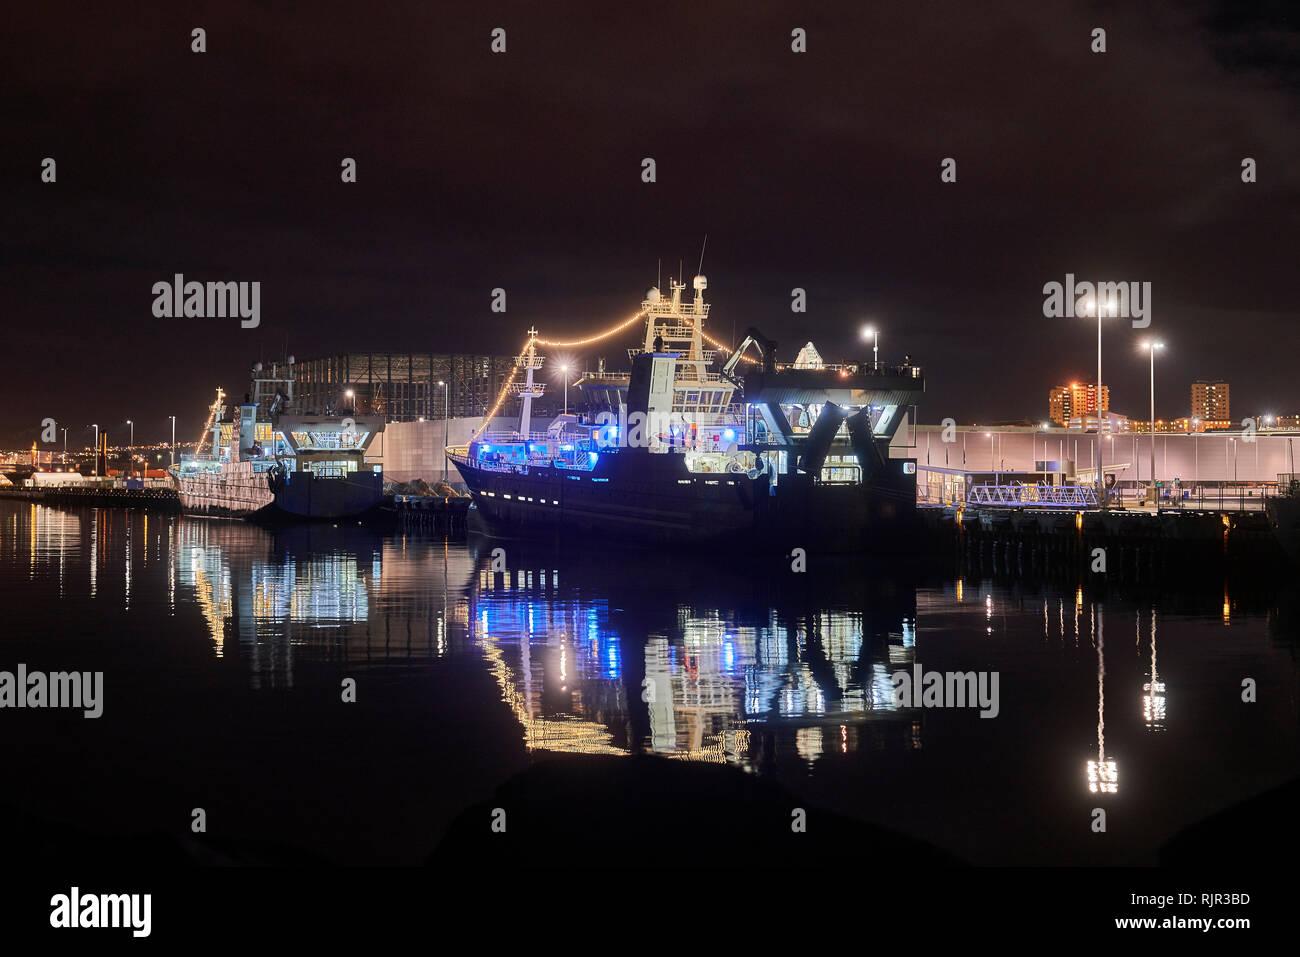 La pesca de arrastre, el puerto de Reykjavik, Reykjavik, Iceland Foto de stock